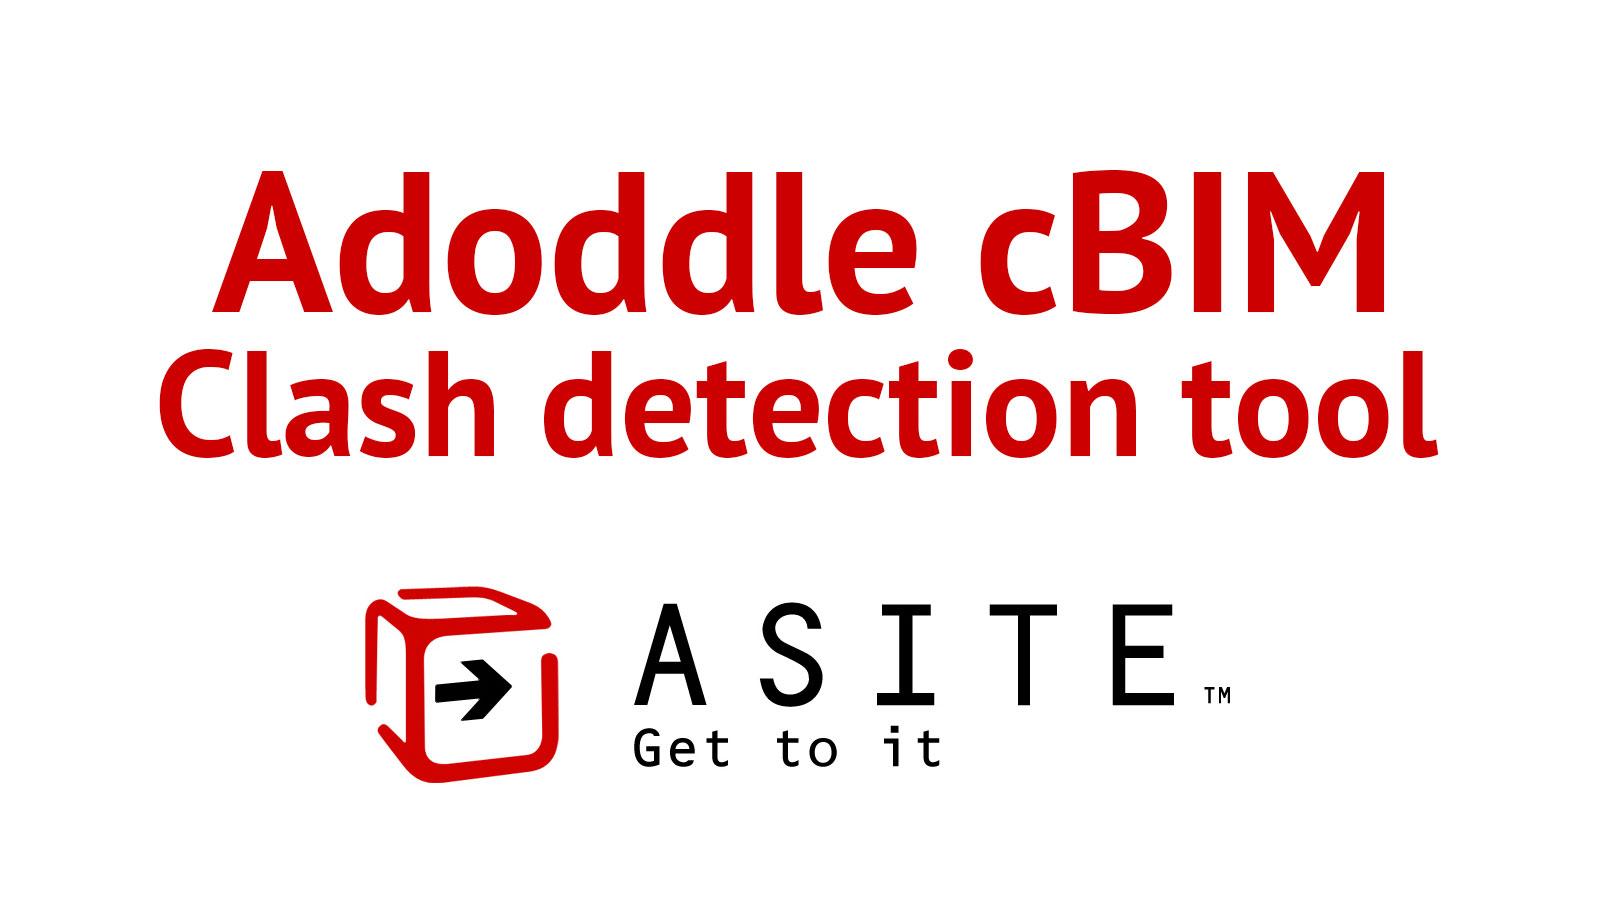 Adoddle cBIM Clash detection tool introduced!